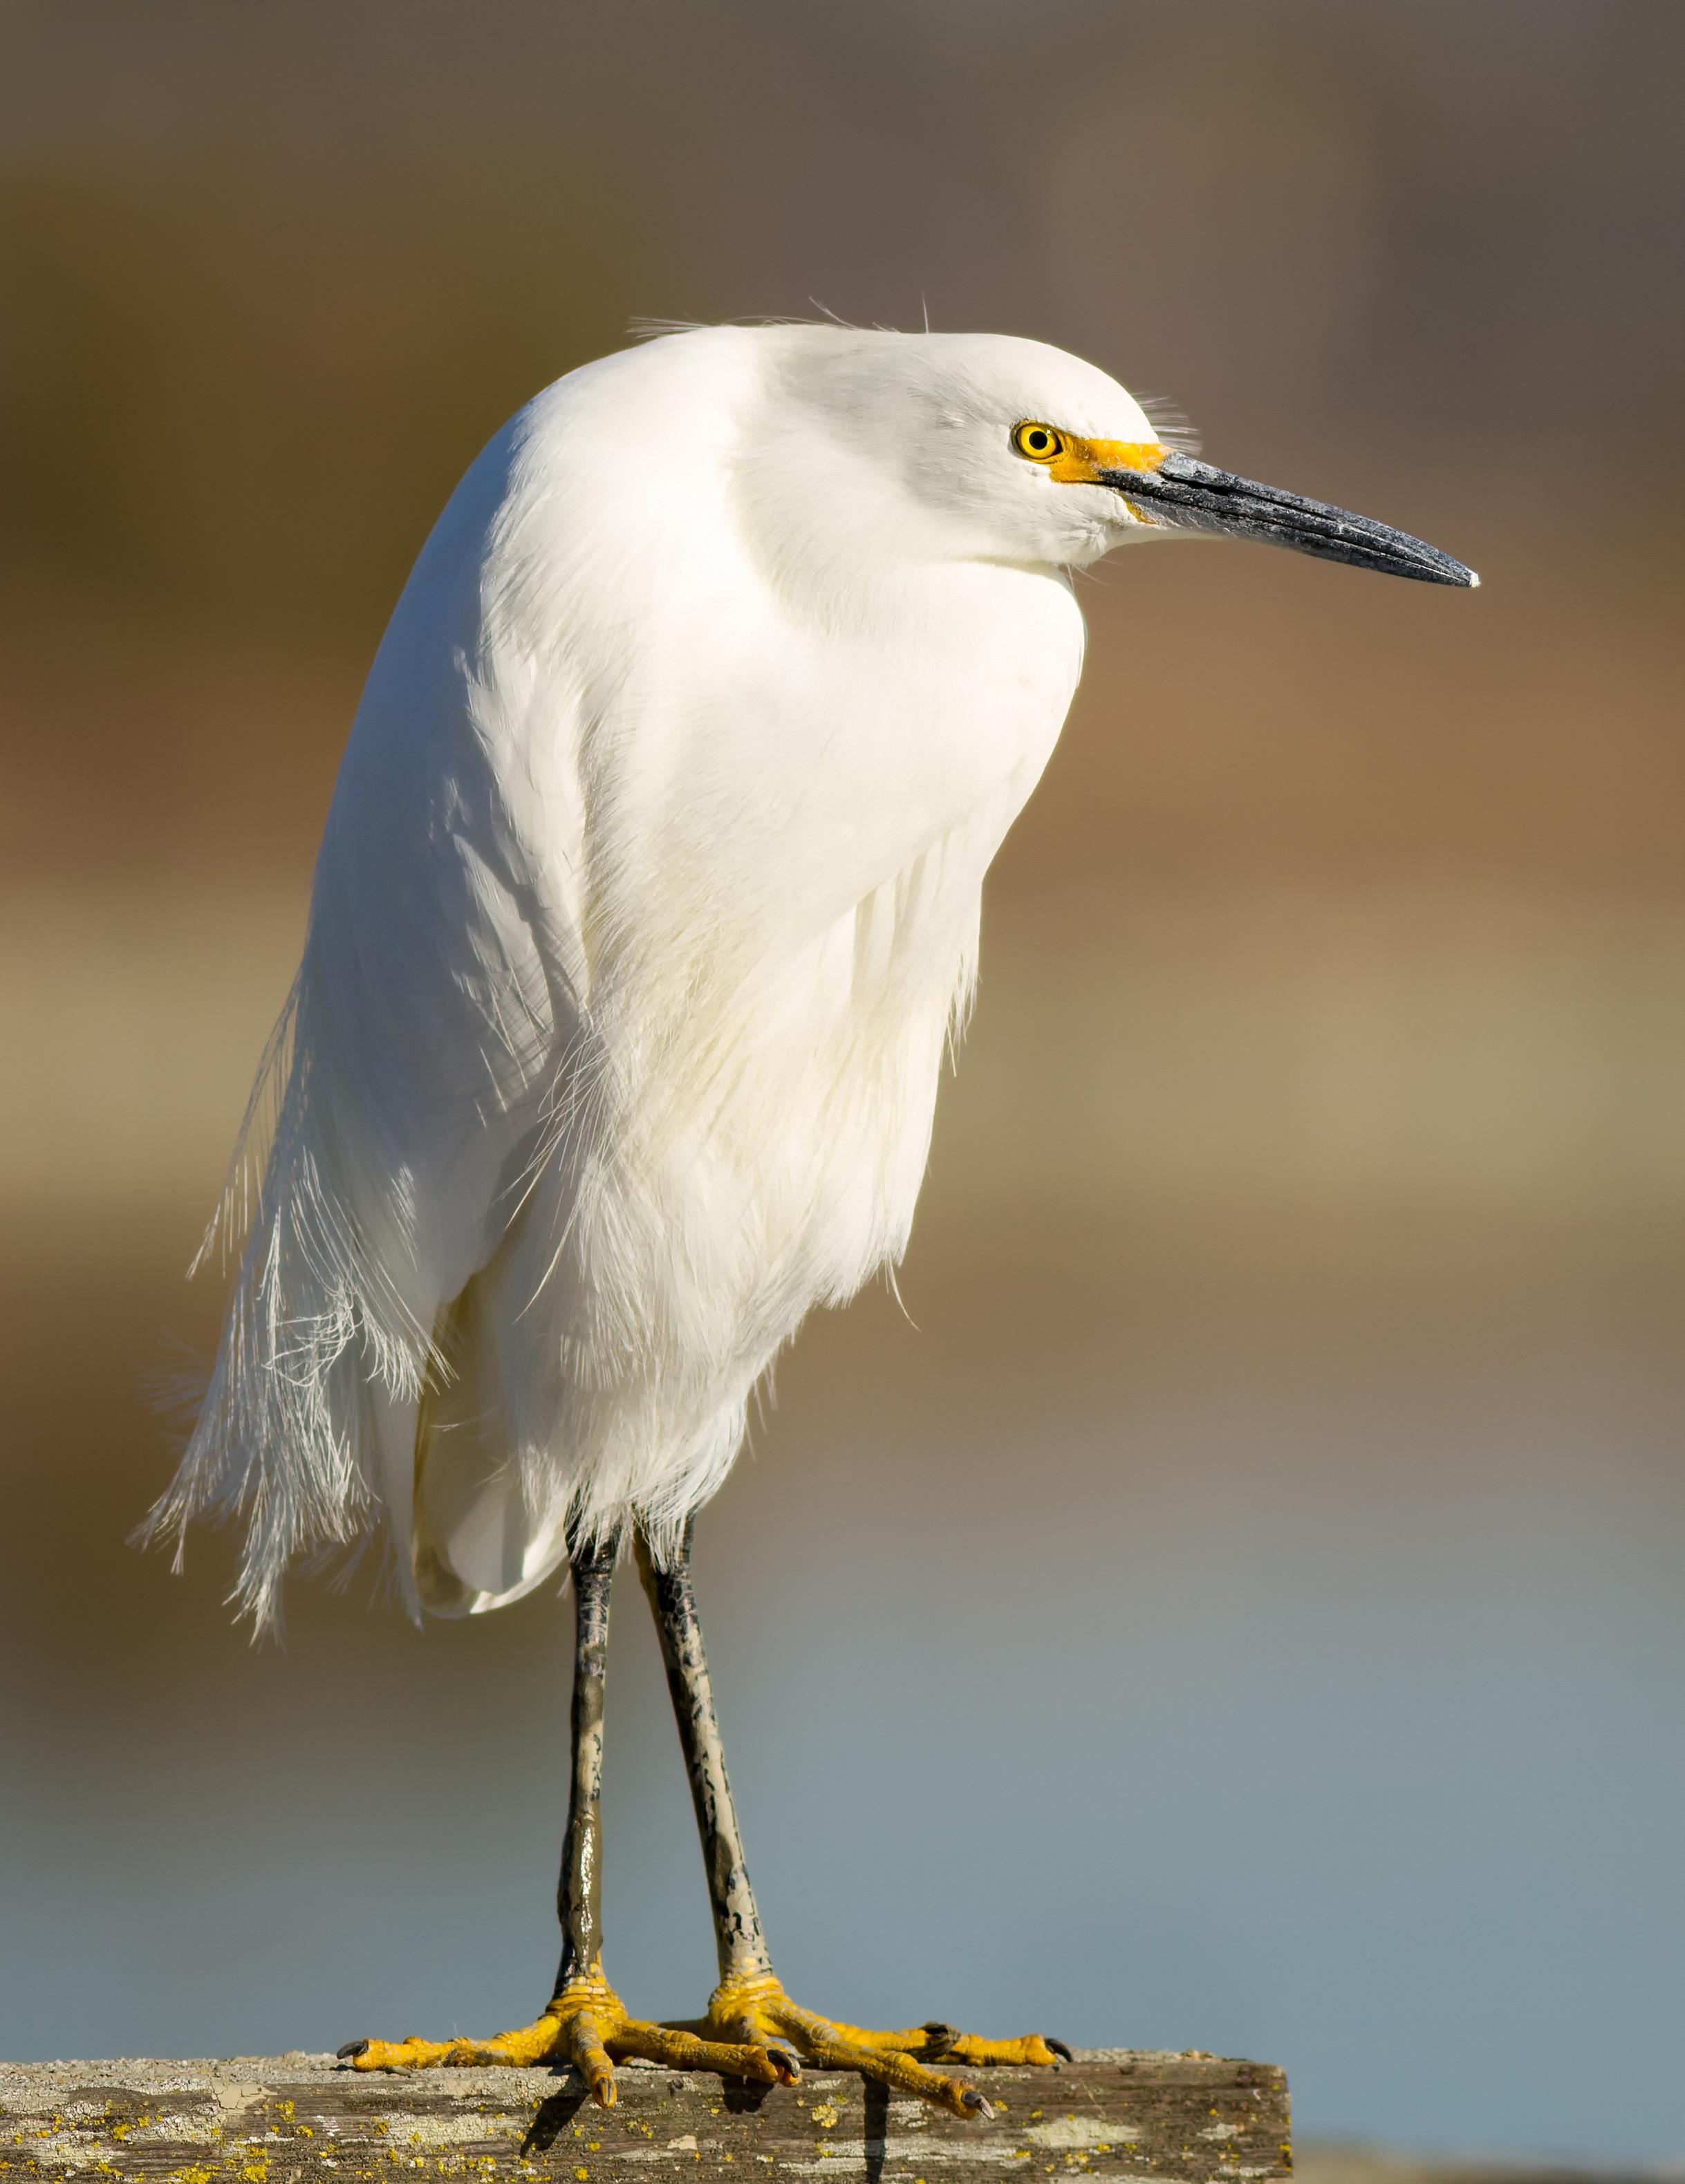 snowy egret by Frank Schulenburg